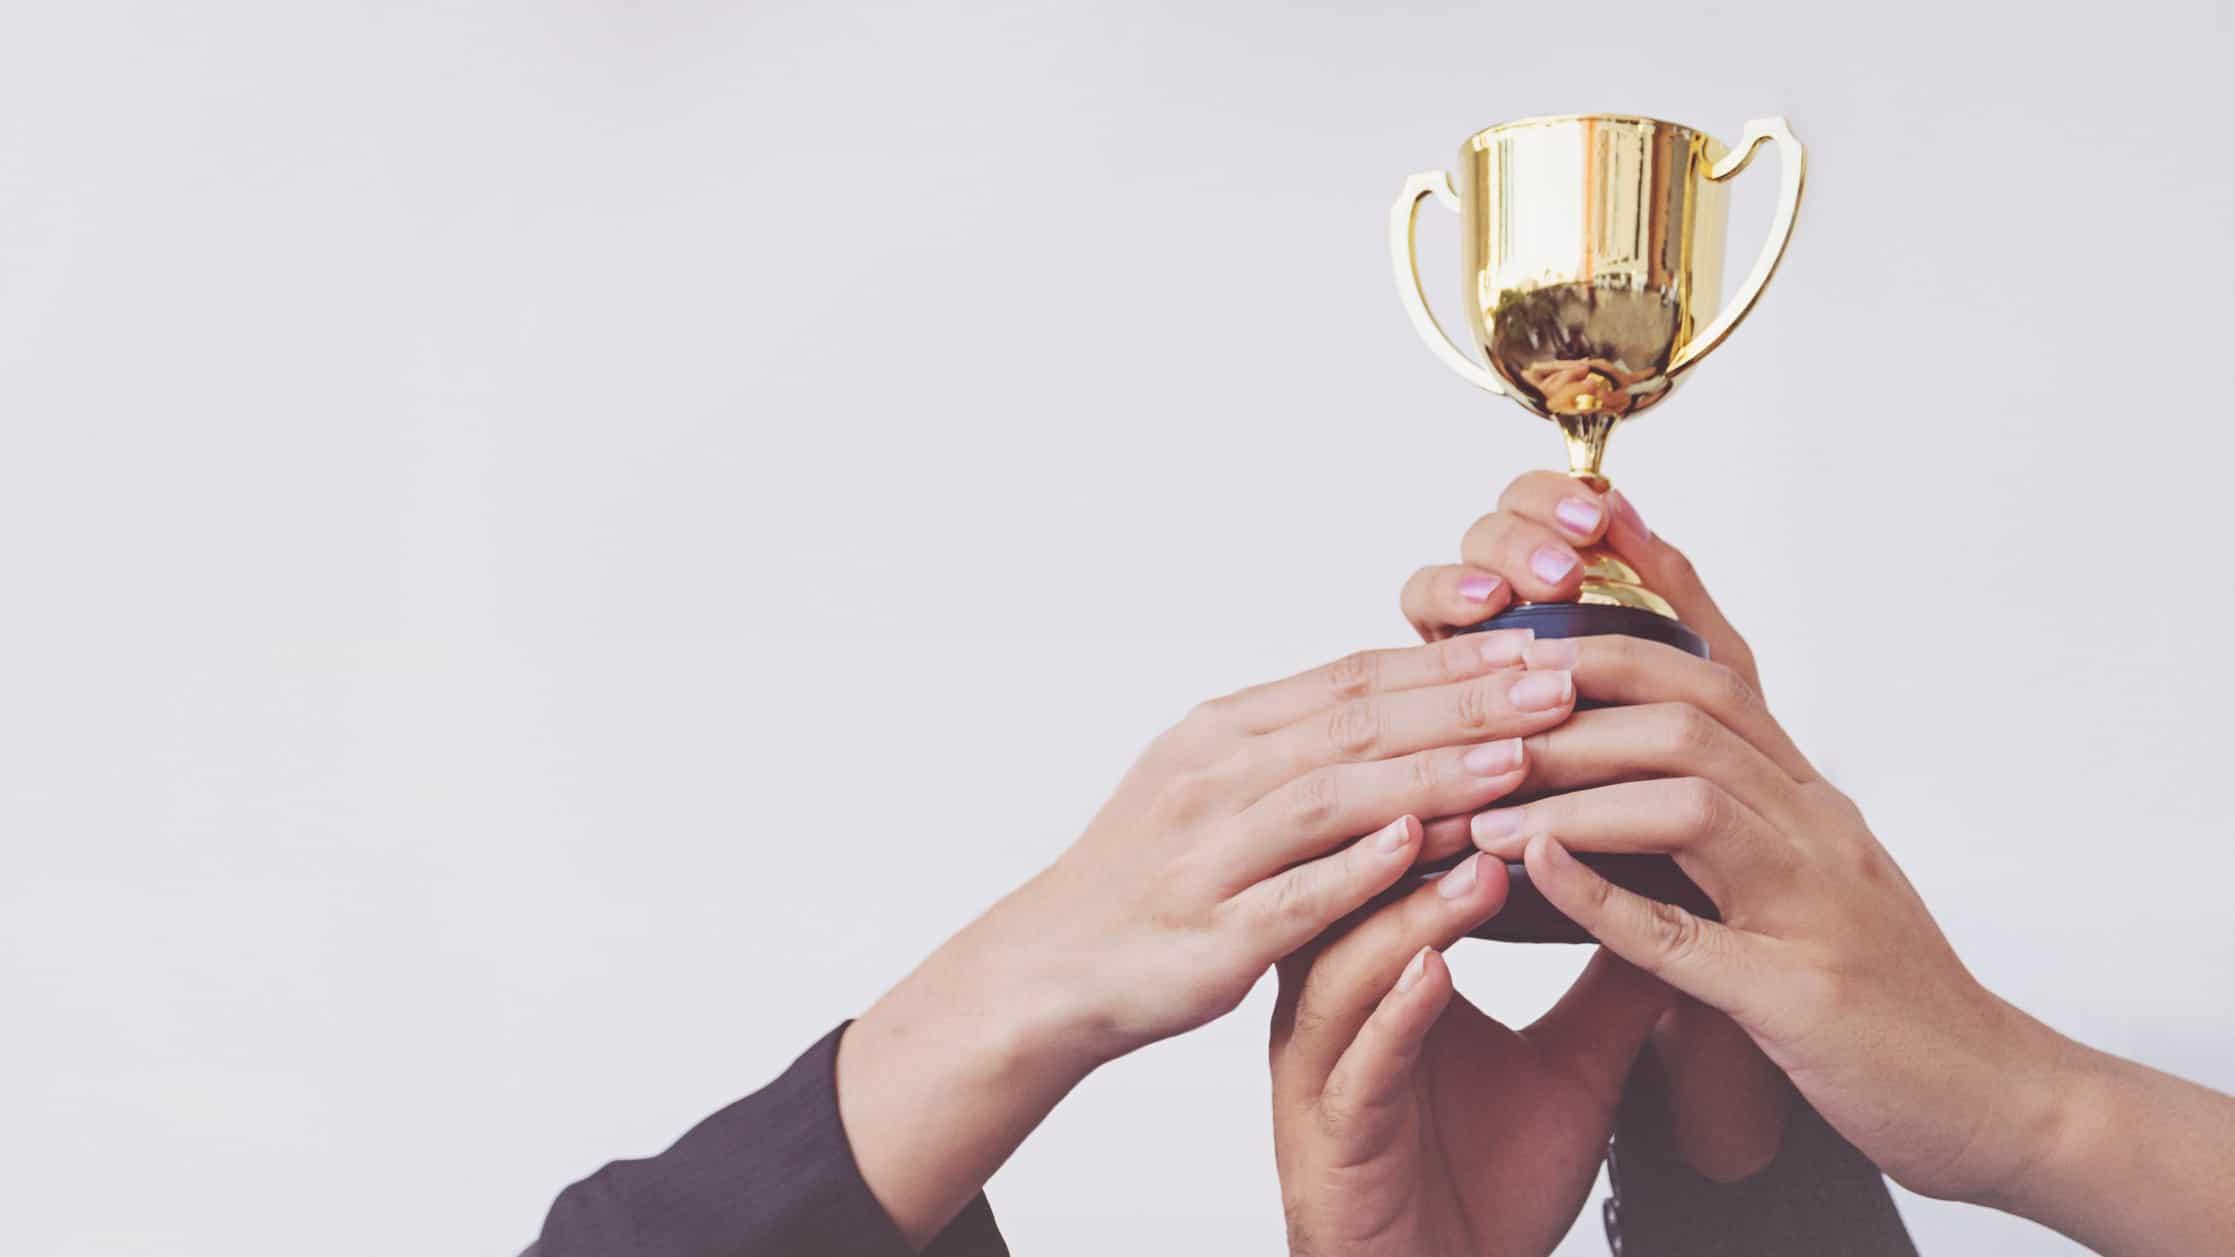 hands holding up winners cup, asx 200 winning shares